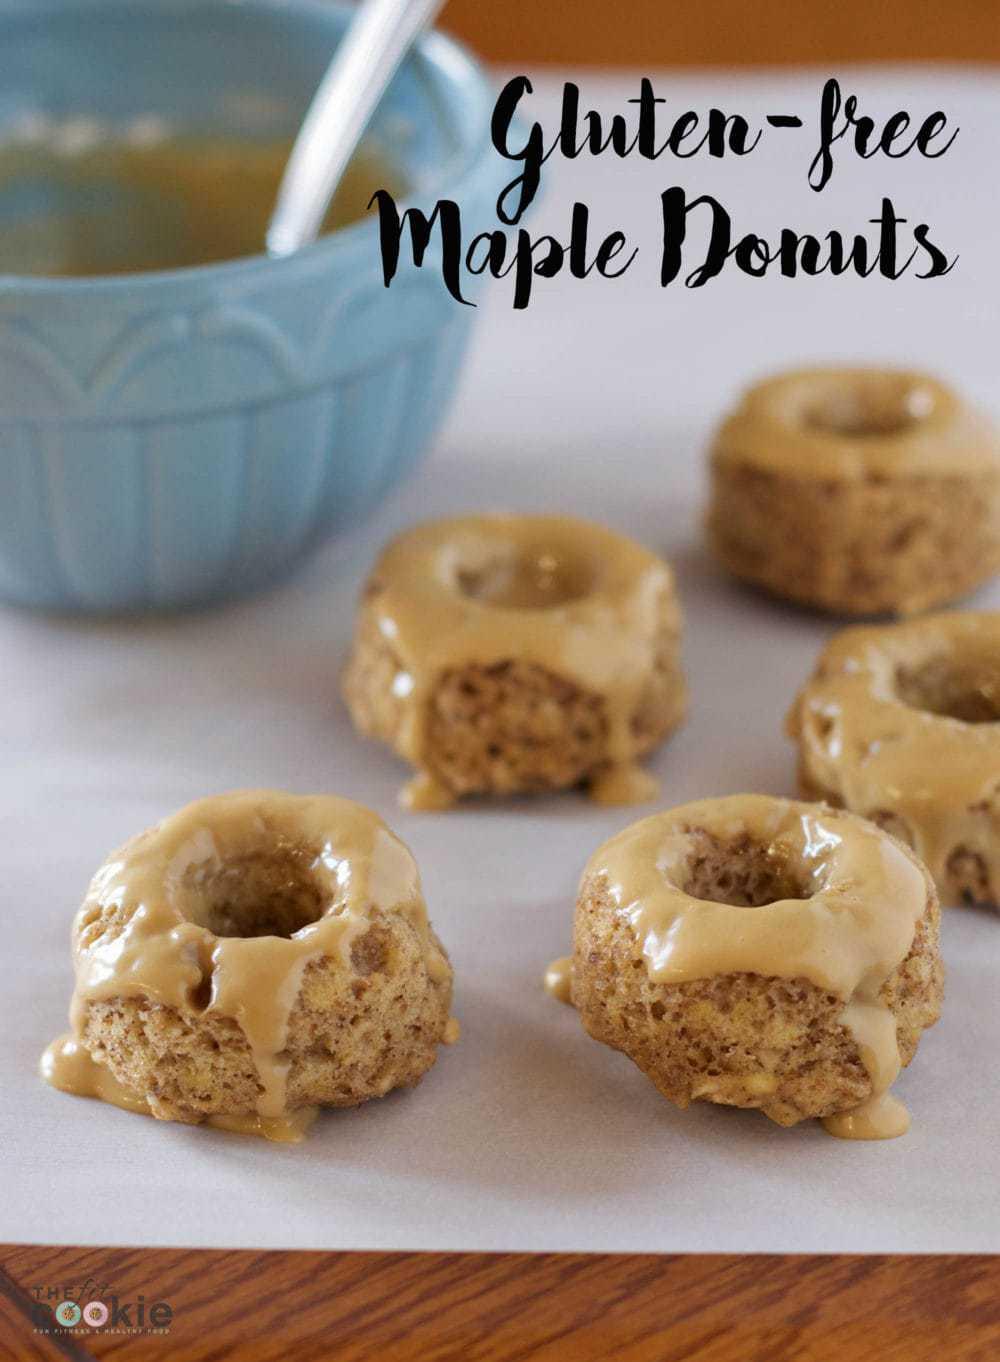 Gluten-free Mini Maple Donuts {#Vegan} - @thefitcookie #recipe #fitfluential #glutenfree #allergyfriendly